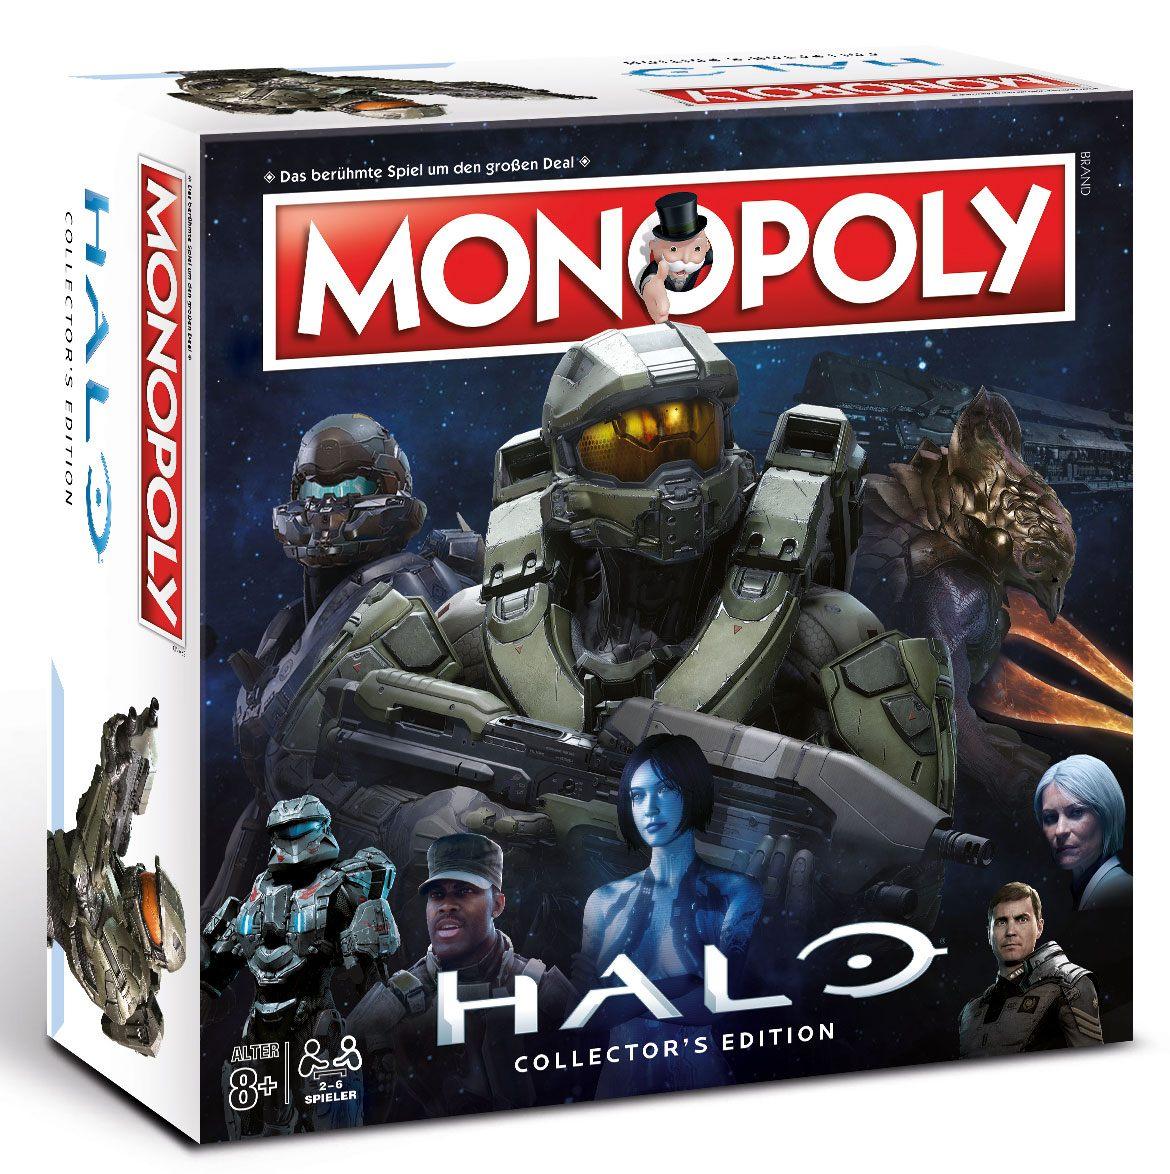 Halo Board Game Monopoly *German Version*